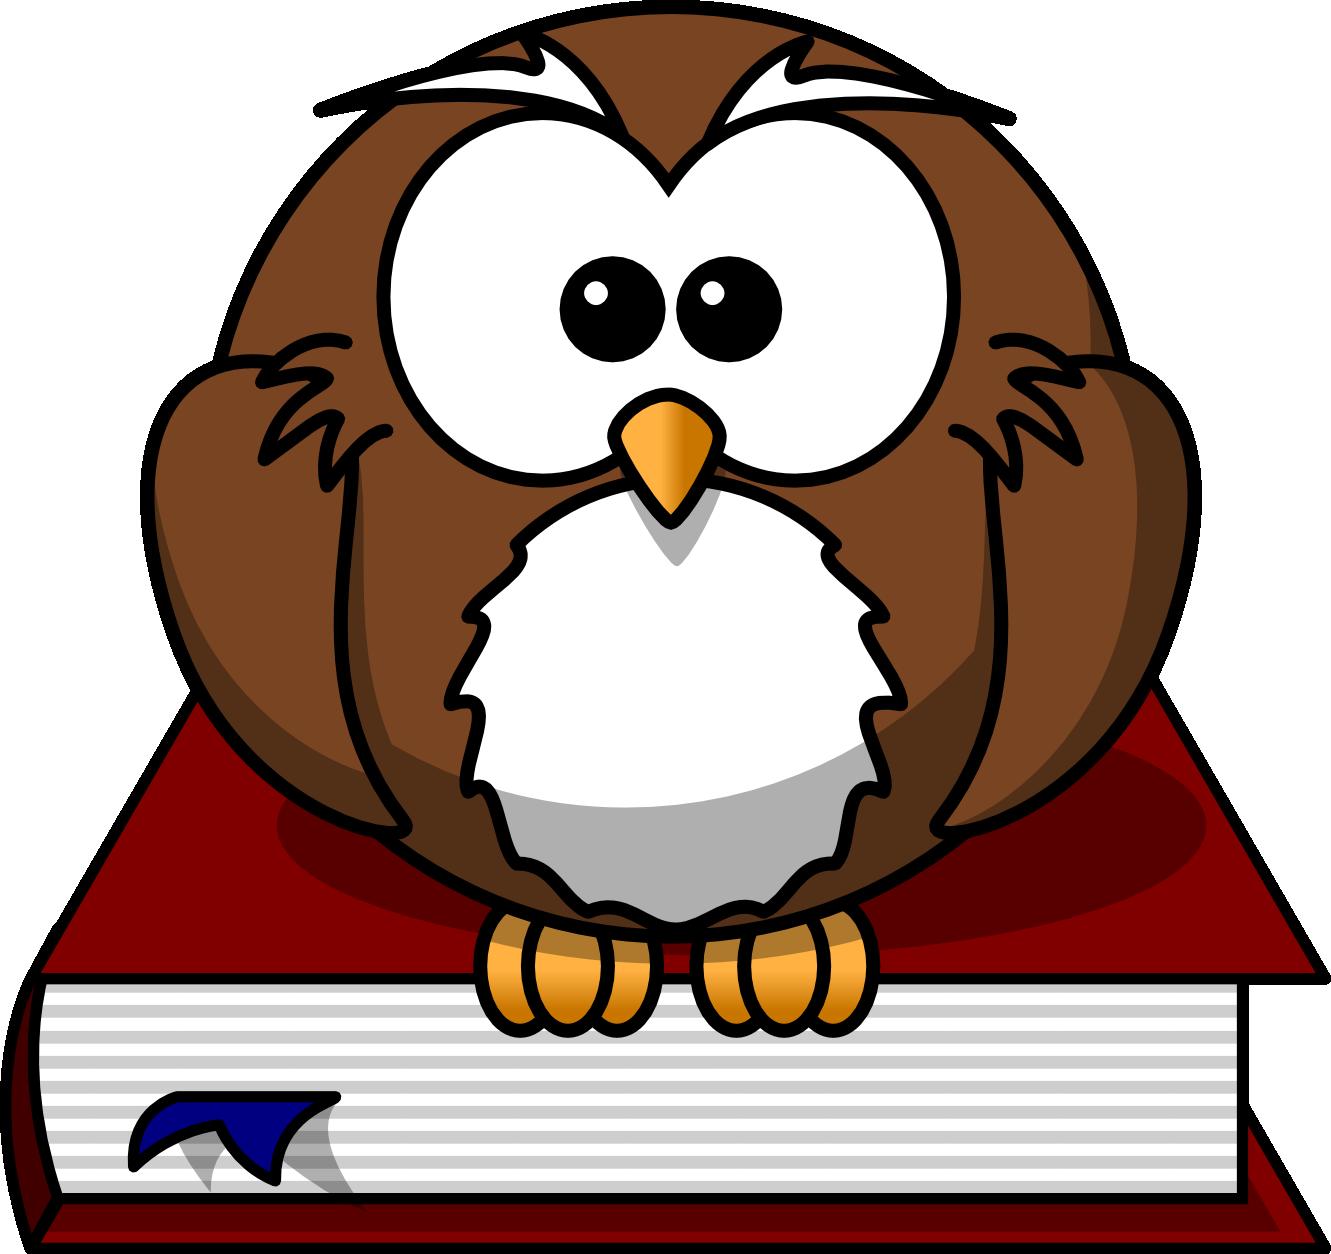 Smart clipart smart owl. Free cartoon png download